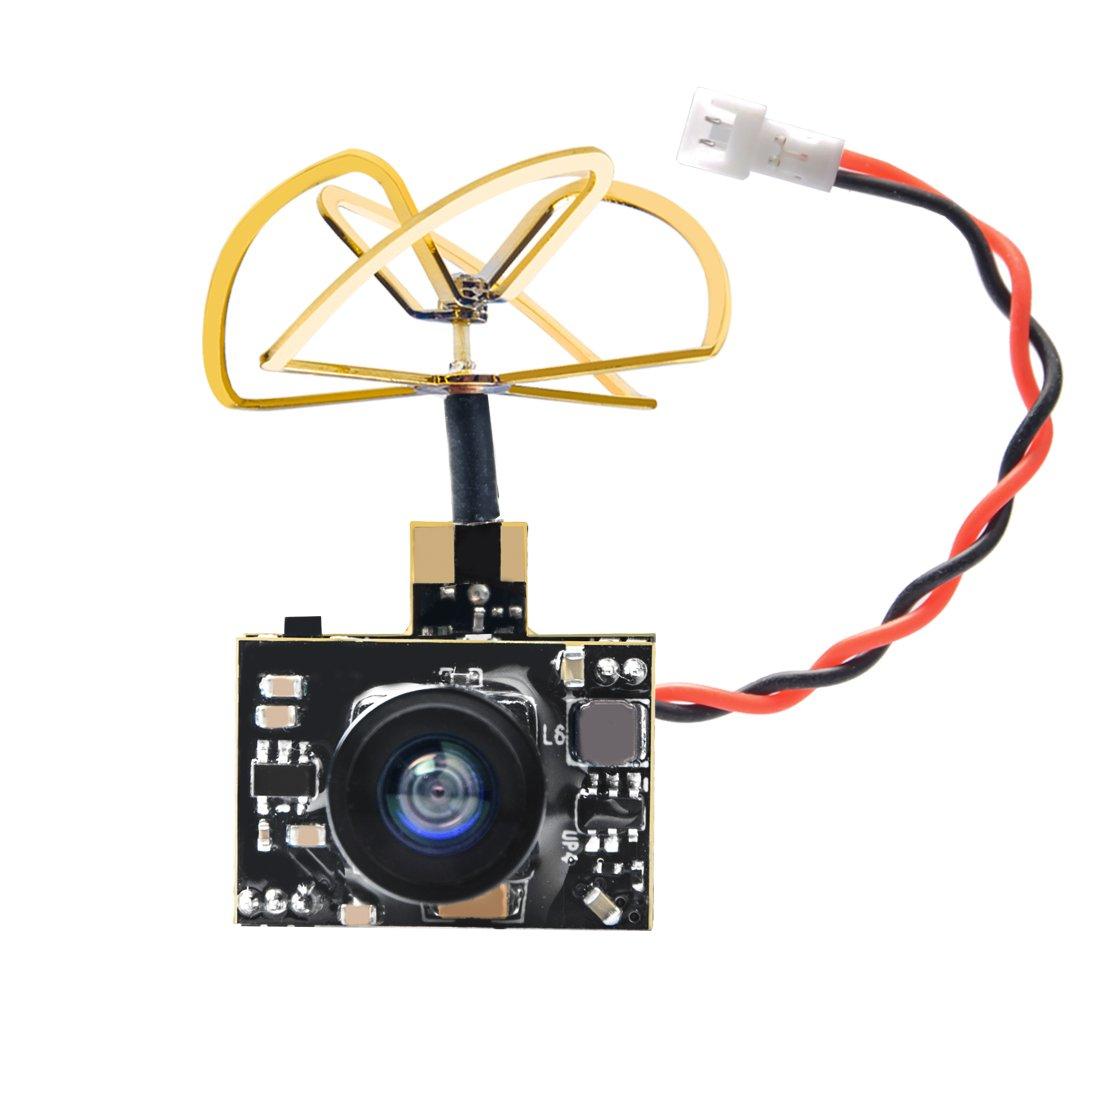 Akk A2 5.8ghz 200mw Fpv Transmisor Raceband 600tvl 1/4 Cmos Mini Camara Fpv Micro Aio Con Antena Clover Para Fpv Drone